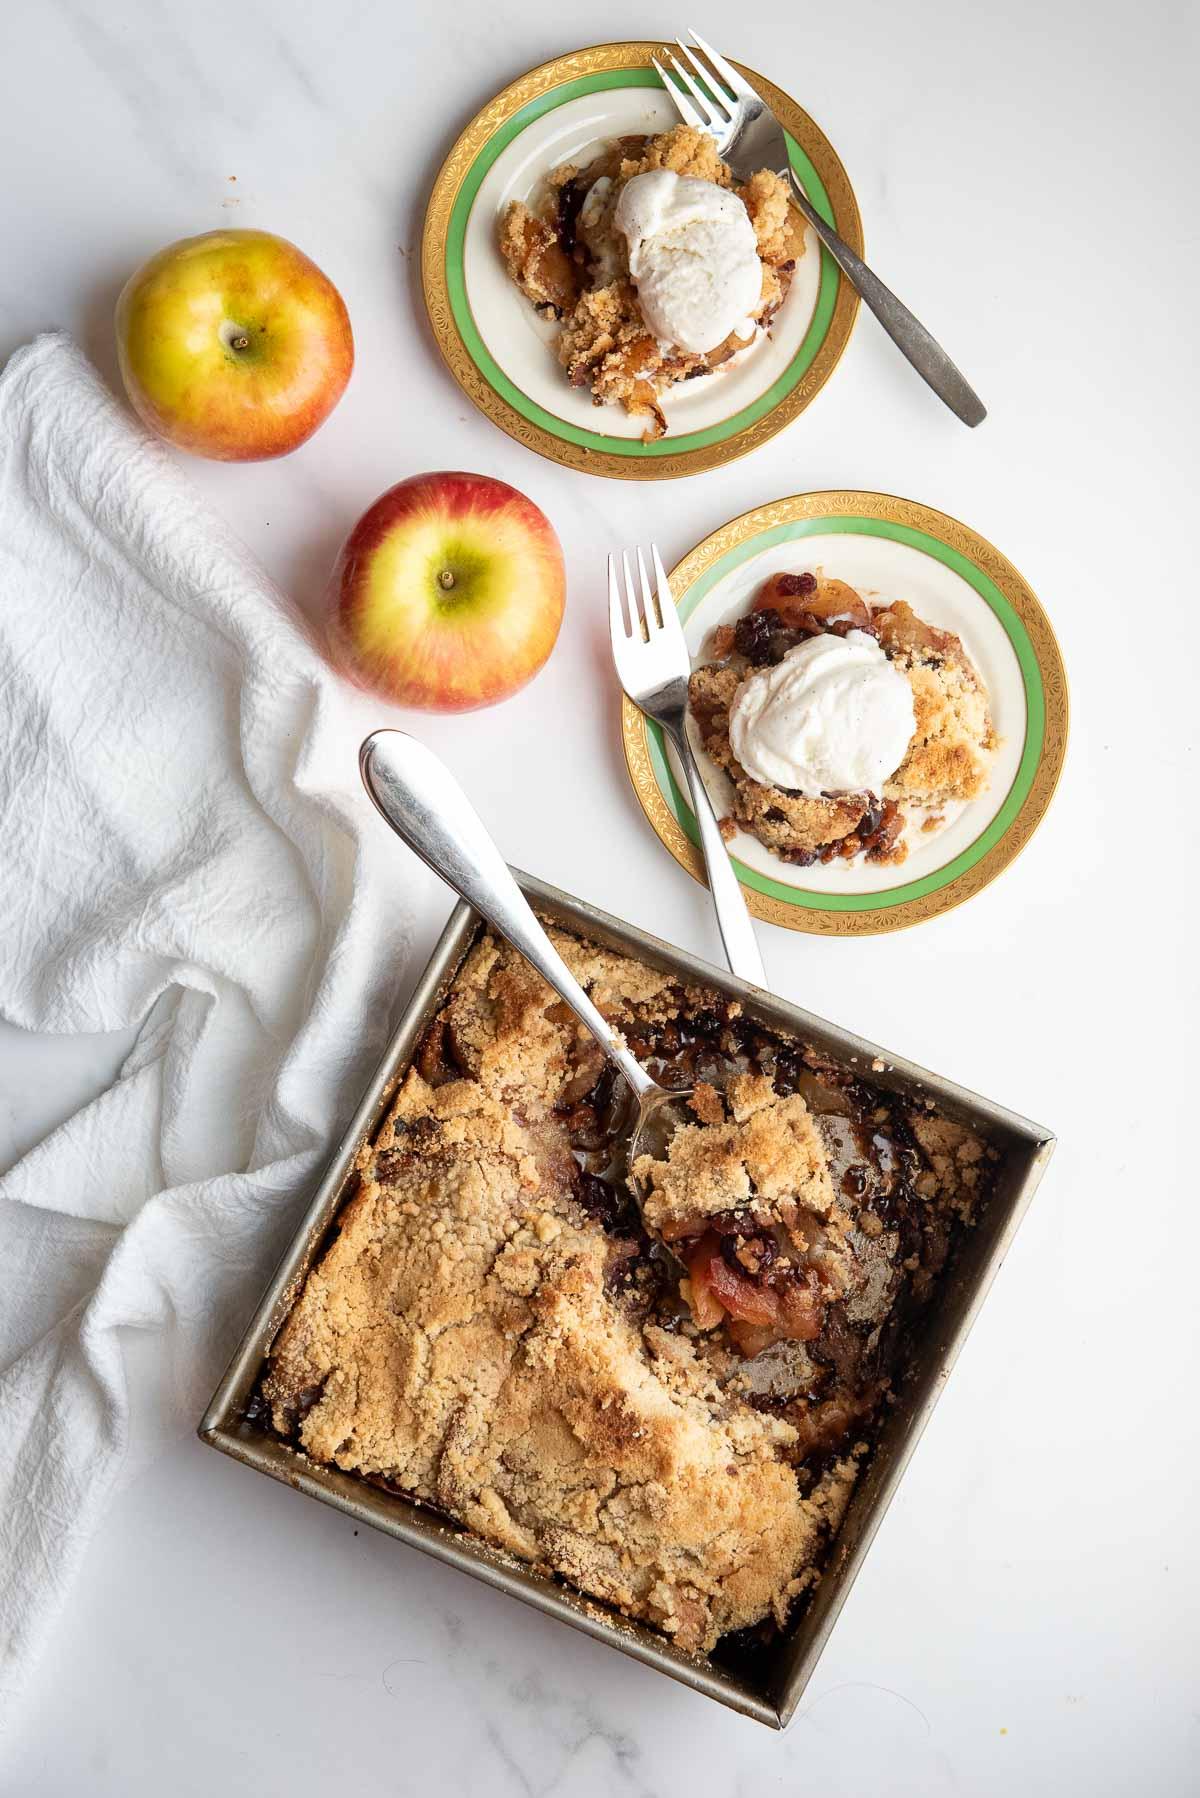 apple crisp in pan and servings